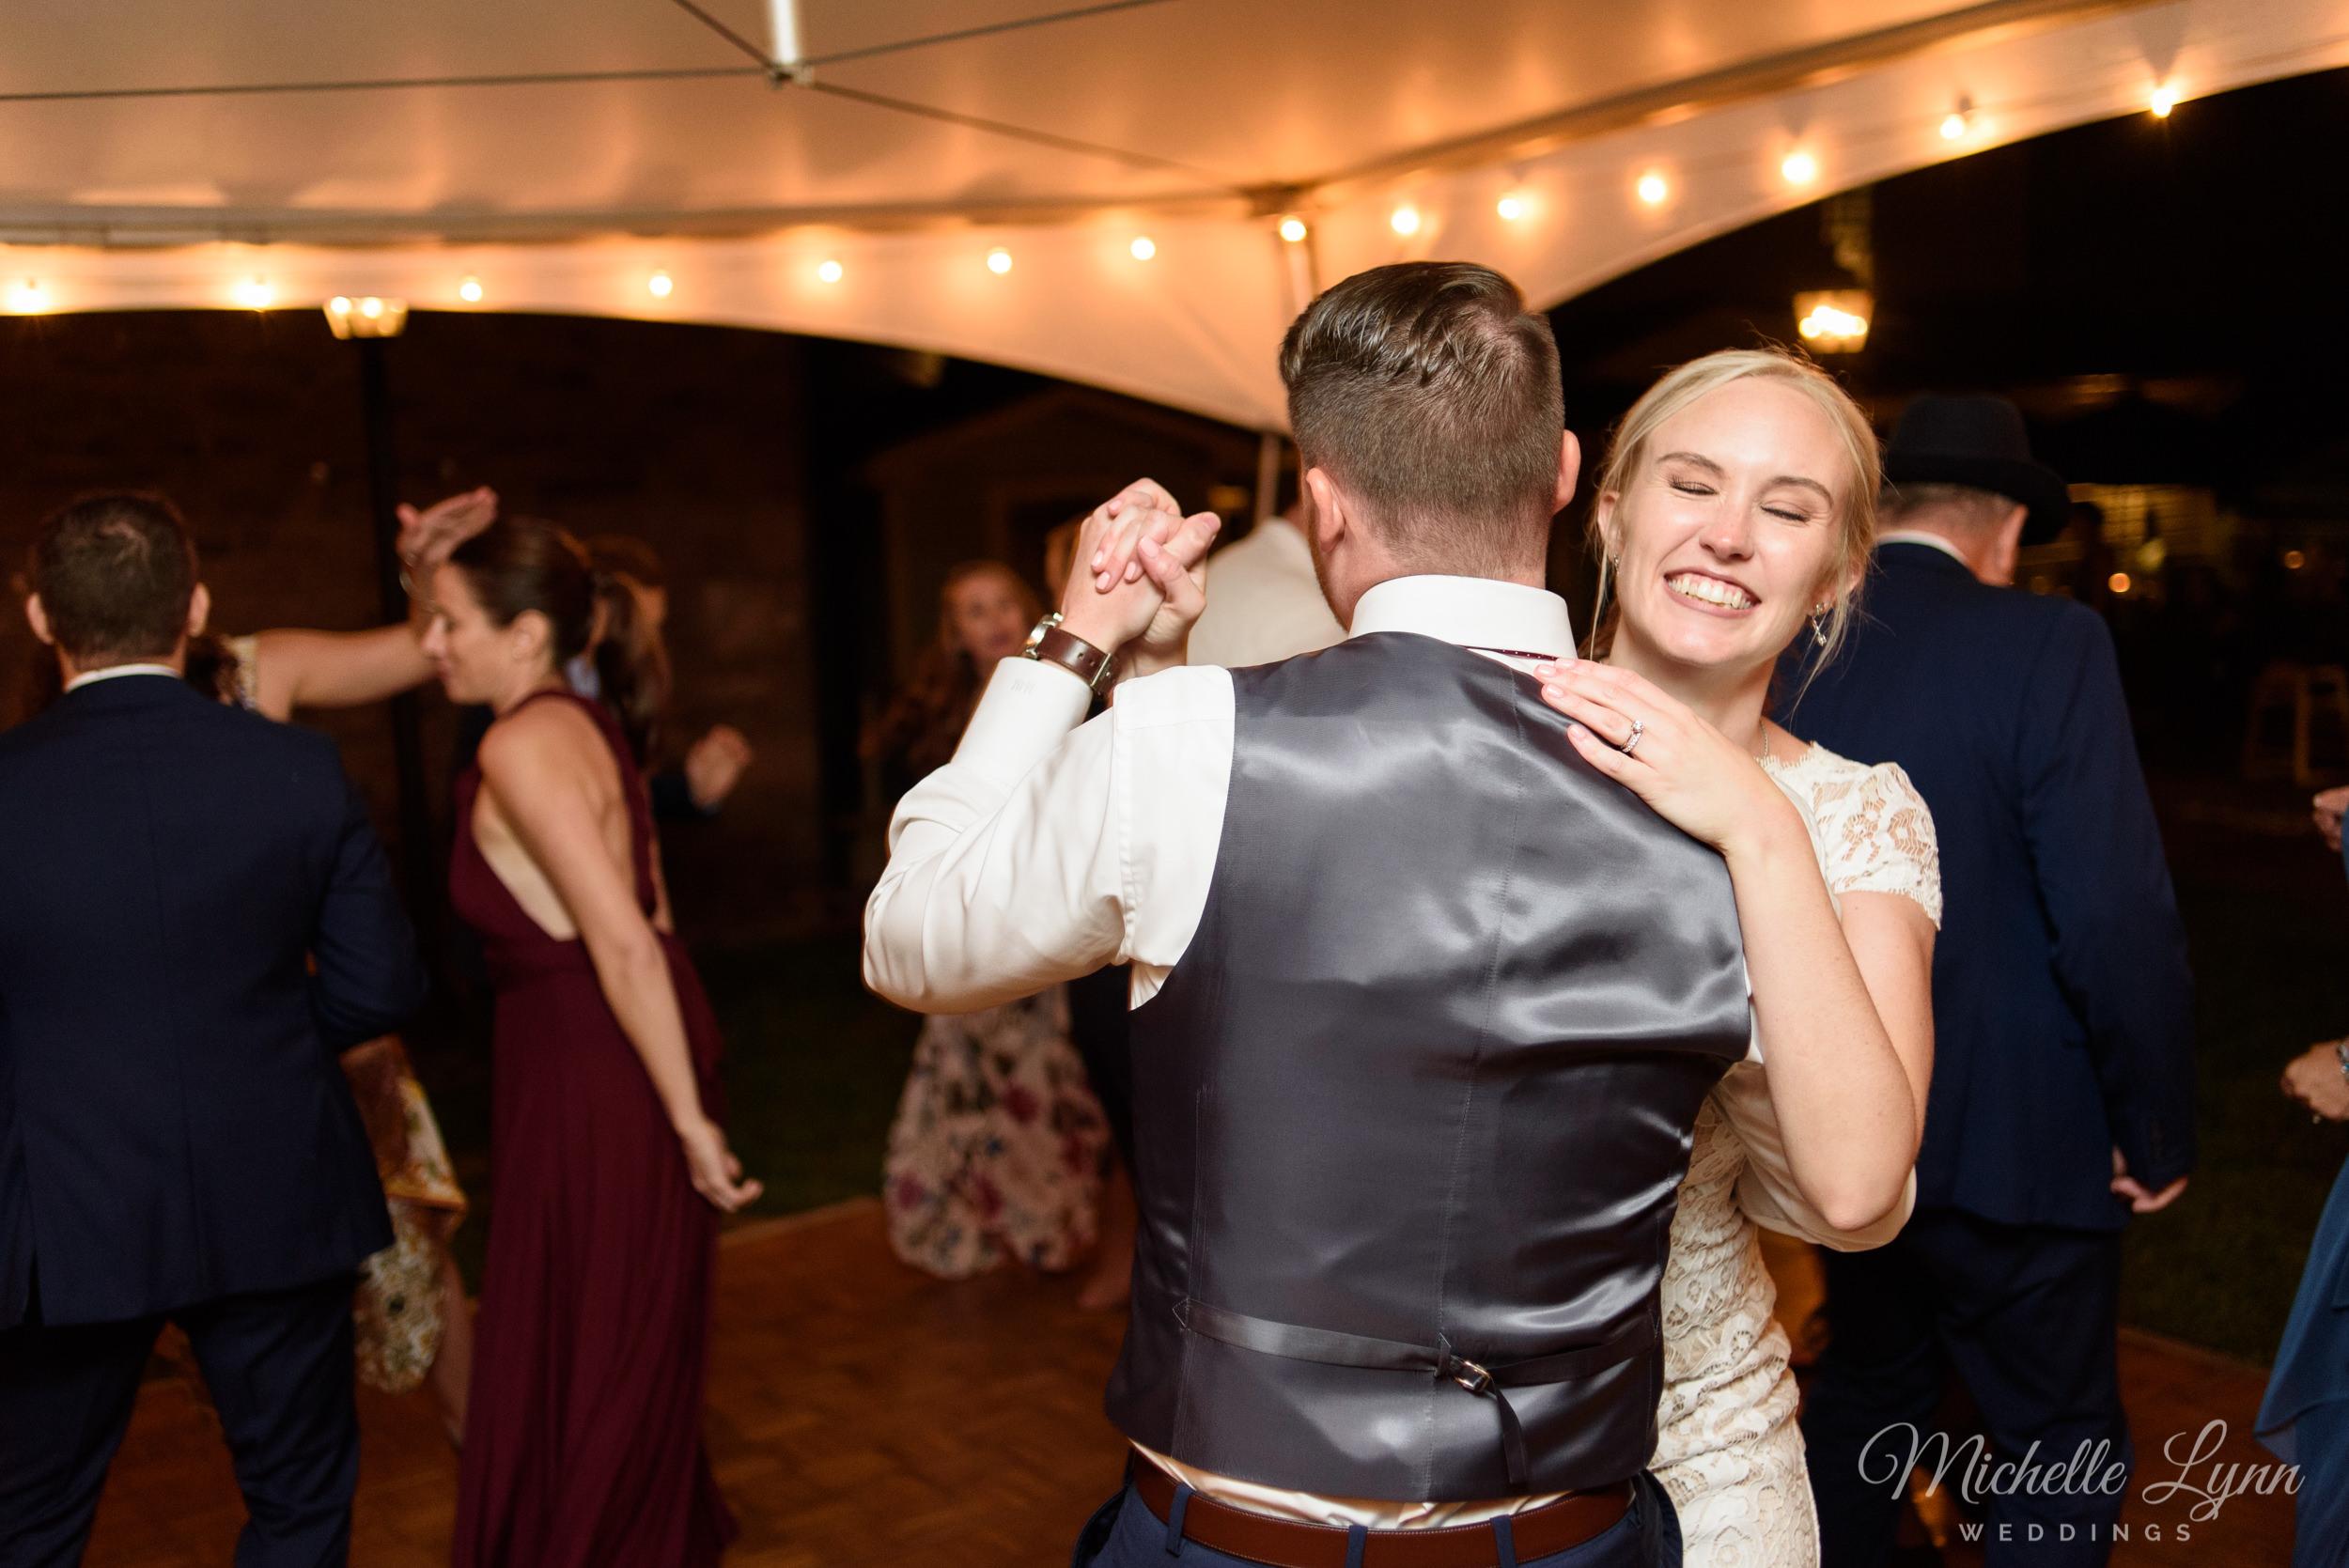 mlw-lumberville-general-store-new-hope-wedding-photographer-76.jpg